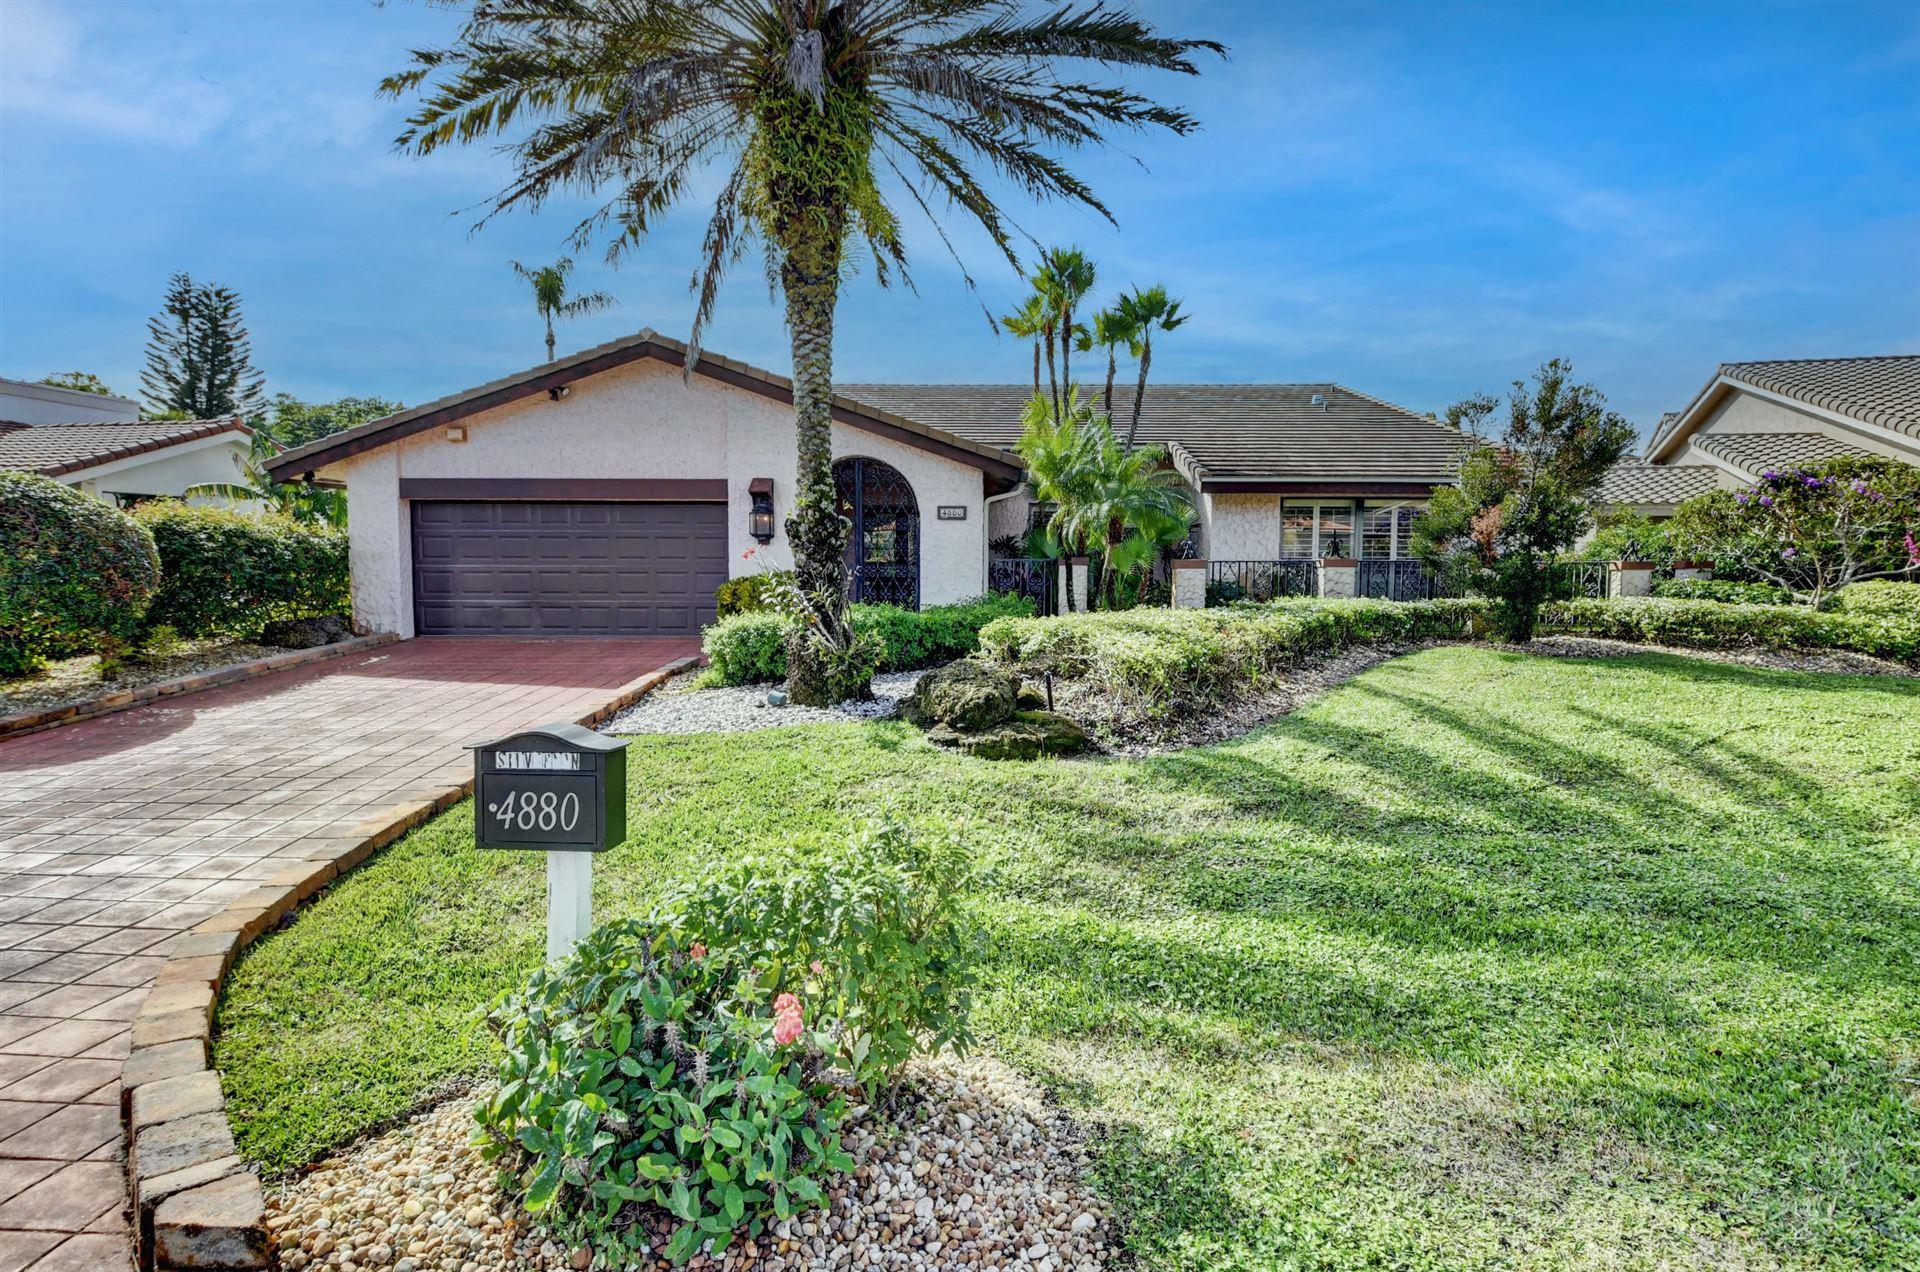 4880 Pineview Circle, Delray Beach, FL 33445 - #: RX-10684665